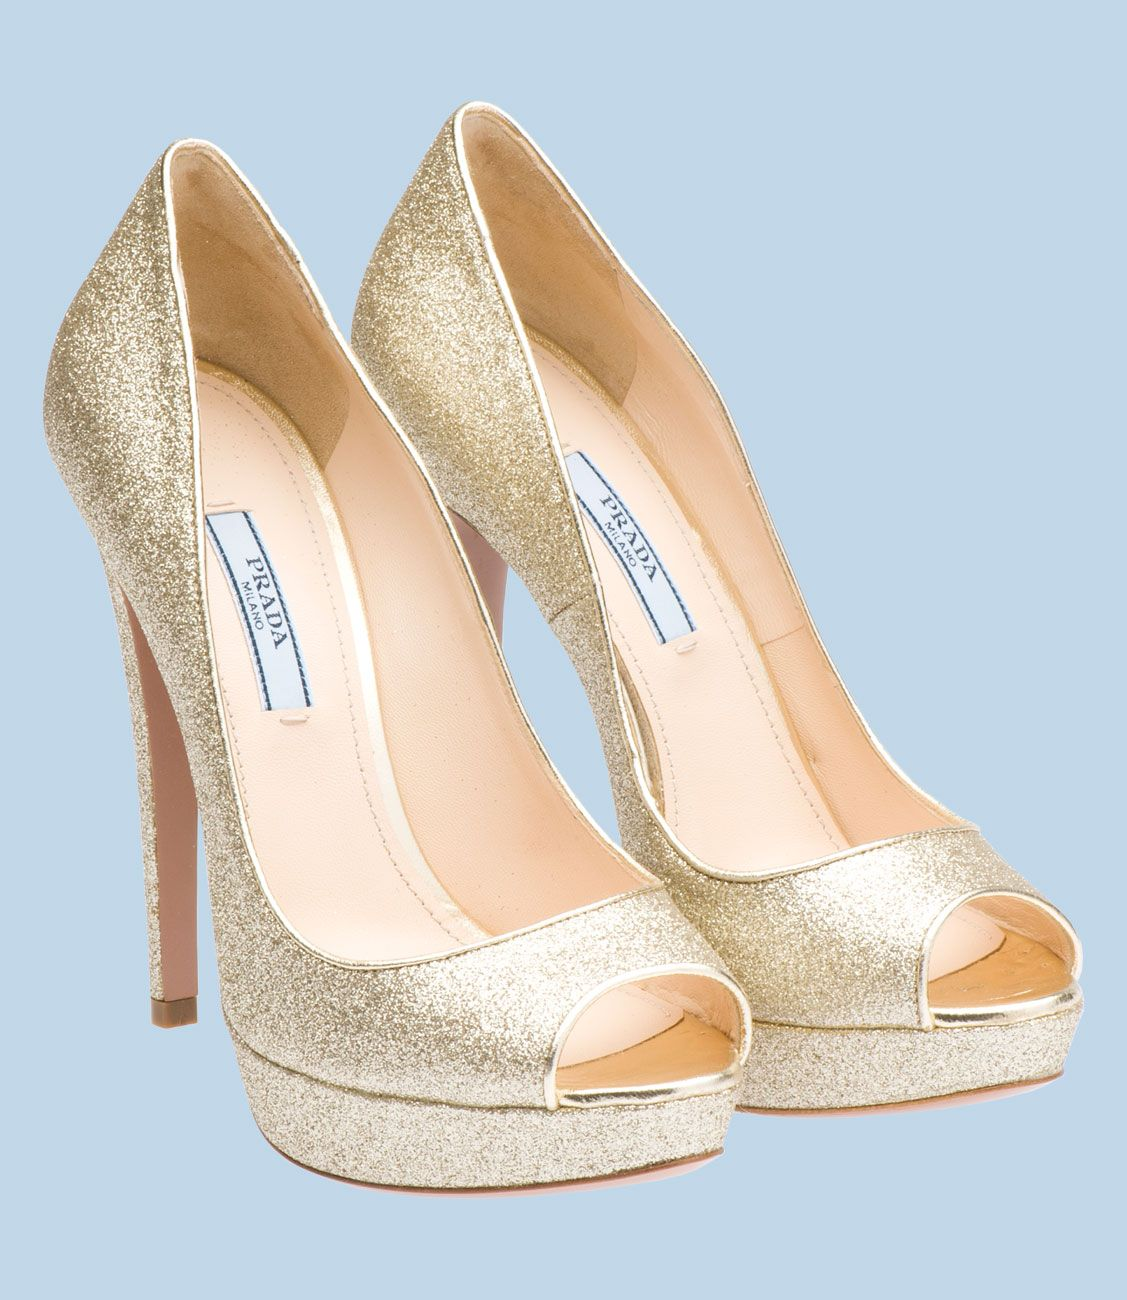 Zapato Shoes Prada Y Mujer Zapatos Glitter Footwear q6pHq